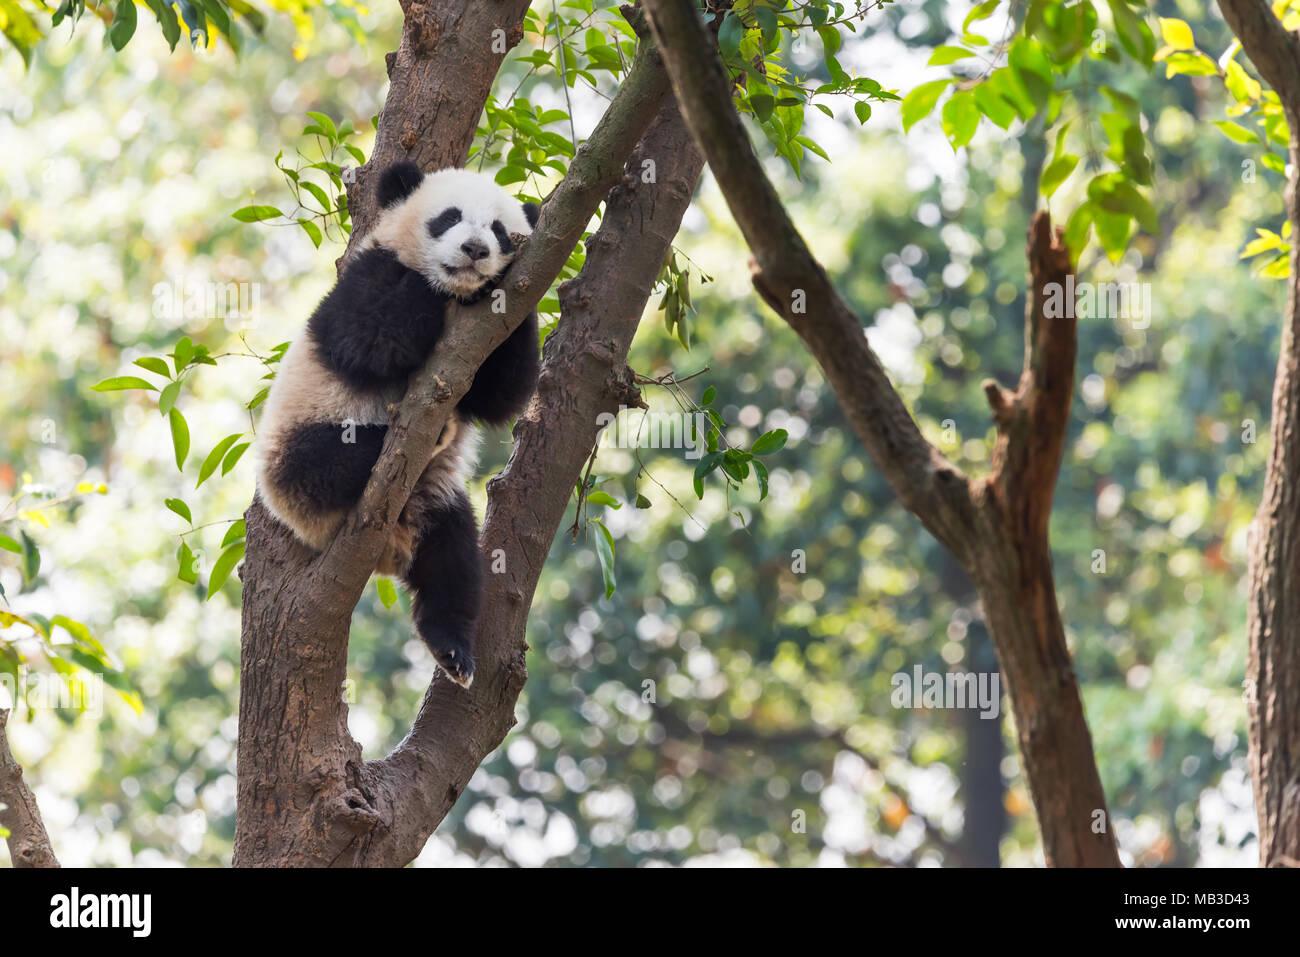 Panda cub dormir dans un arbre, Chengdu, Chine Photo Stock